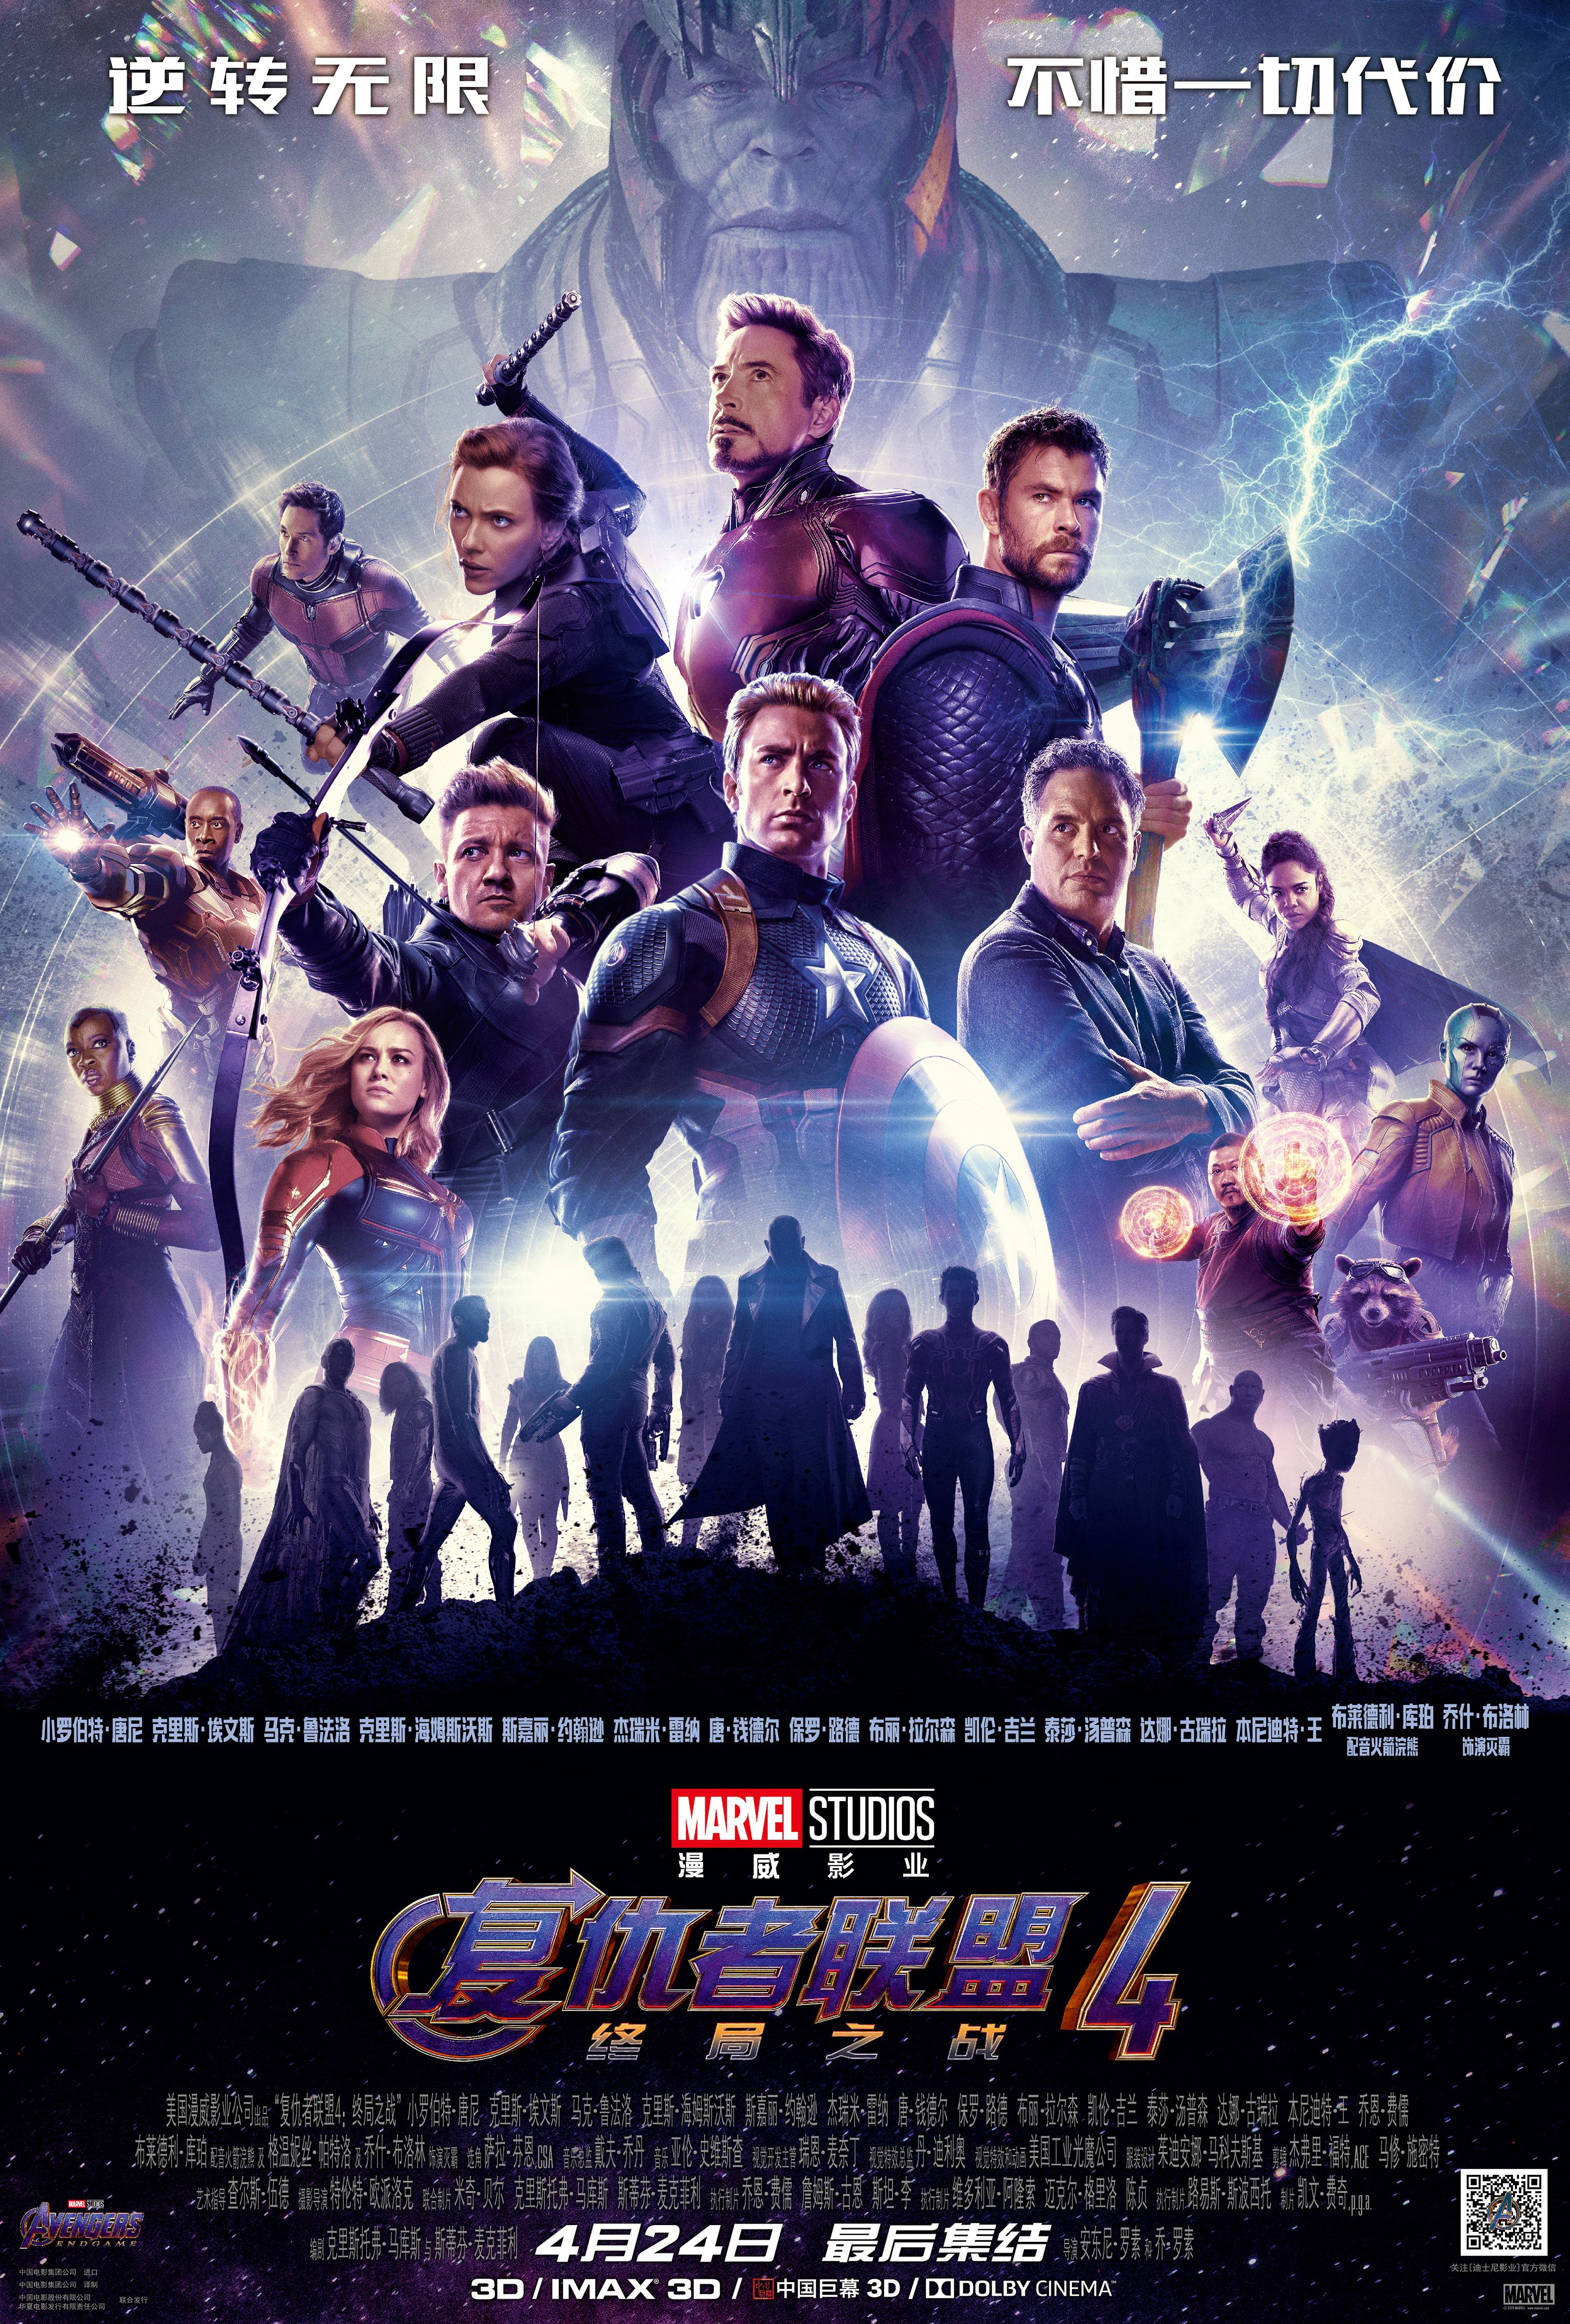 High Quality Prints Dolby Cinema Art Work Avengers Endgame Movie Poster